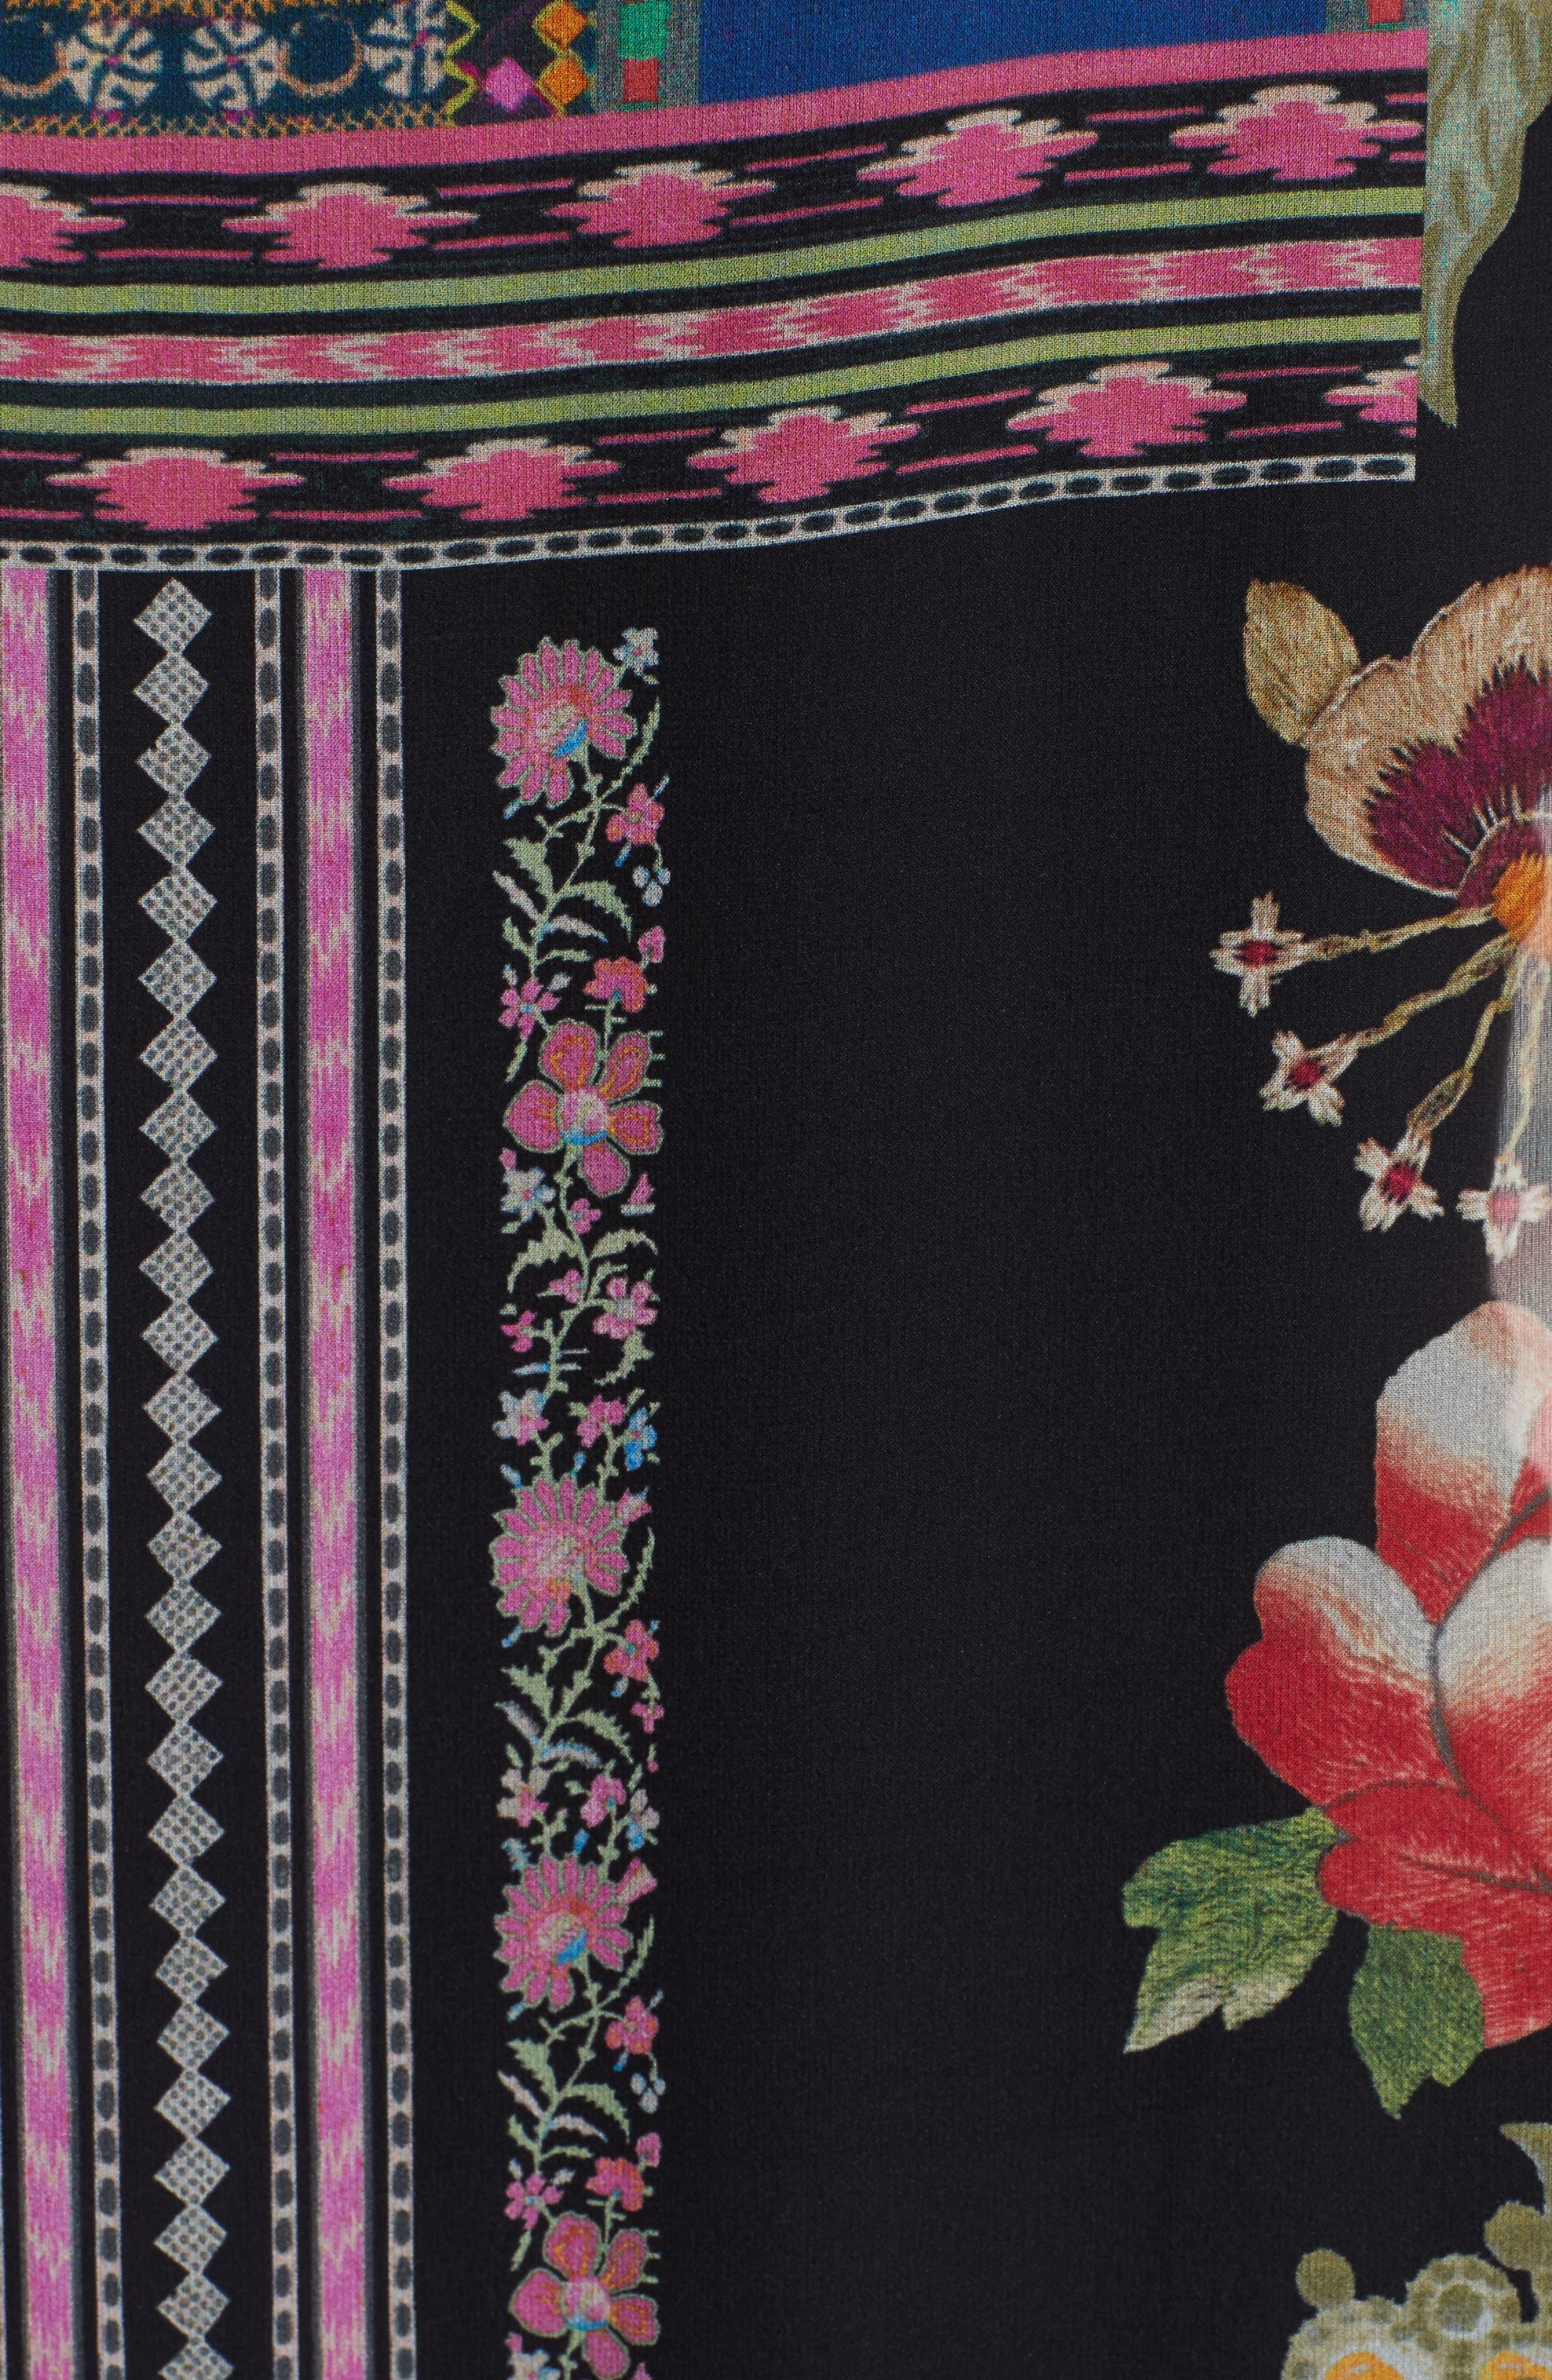 Fringe Trim Floral Print Silk Poncho,                             Alternate thumbnail 3, color,                             Pink